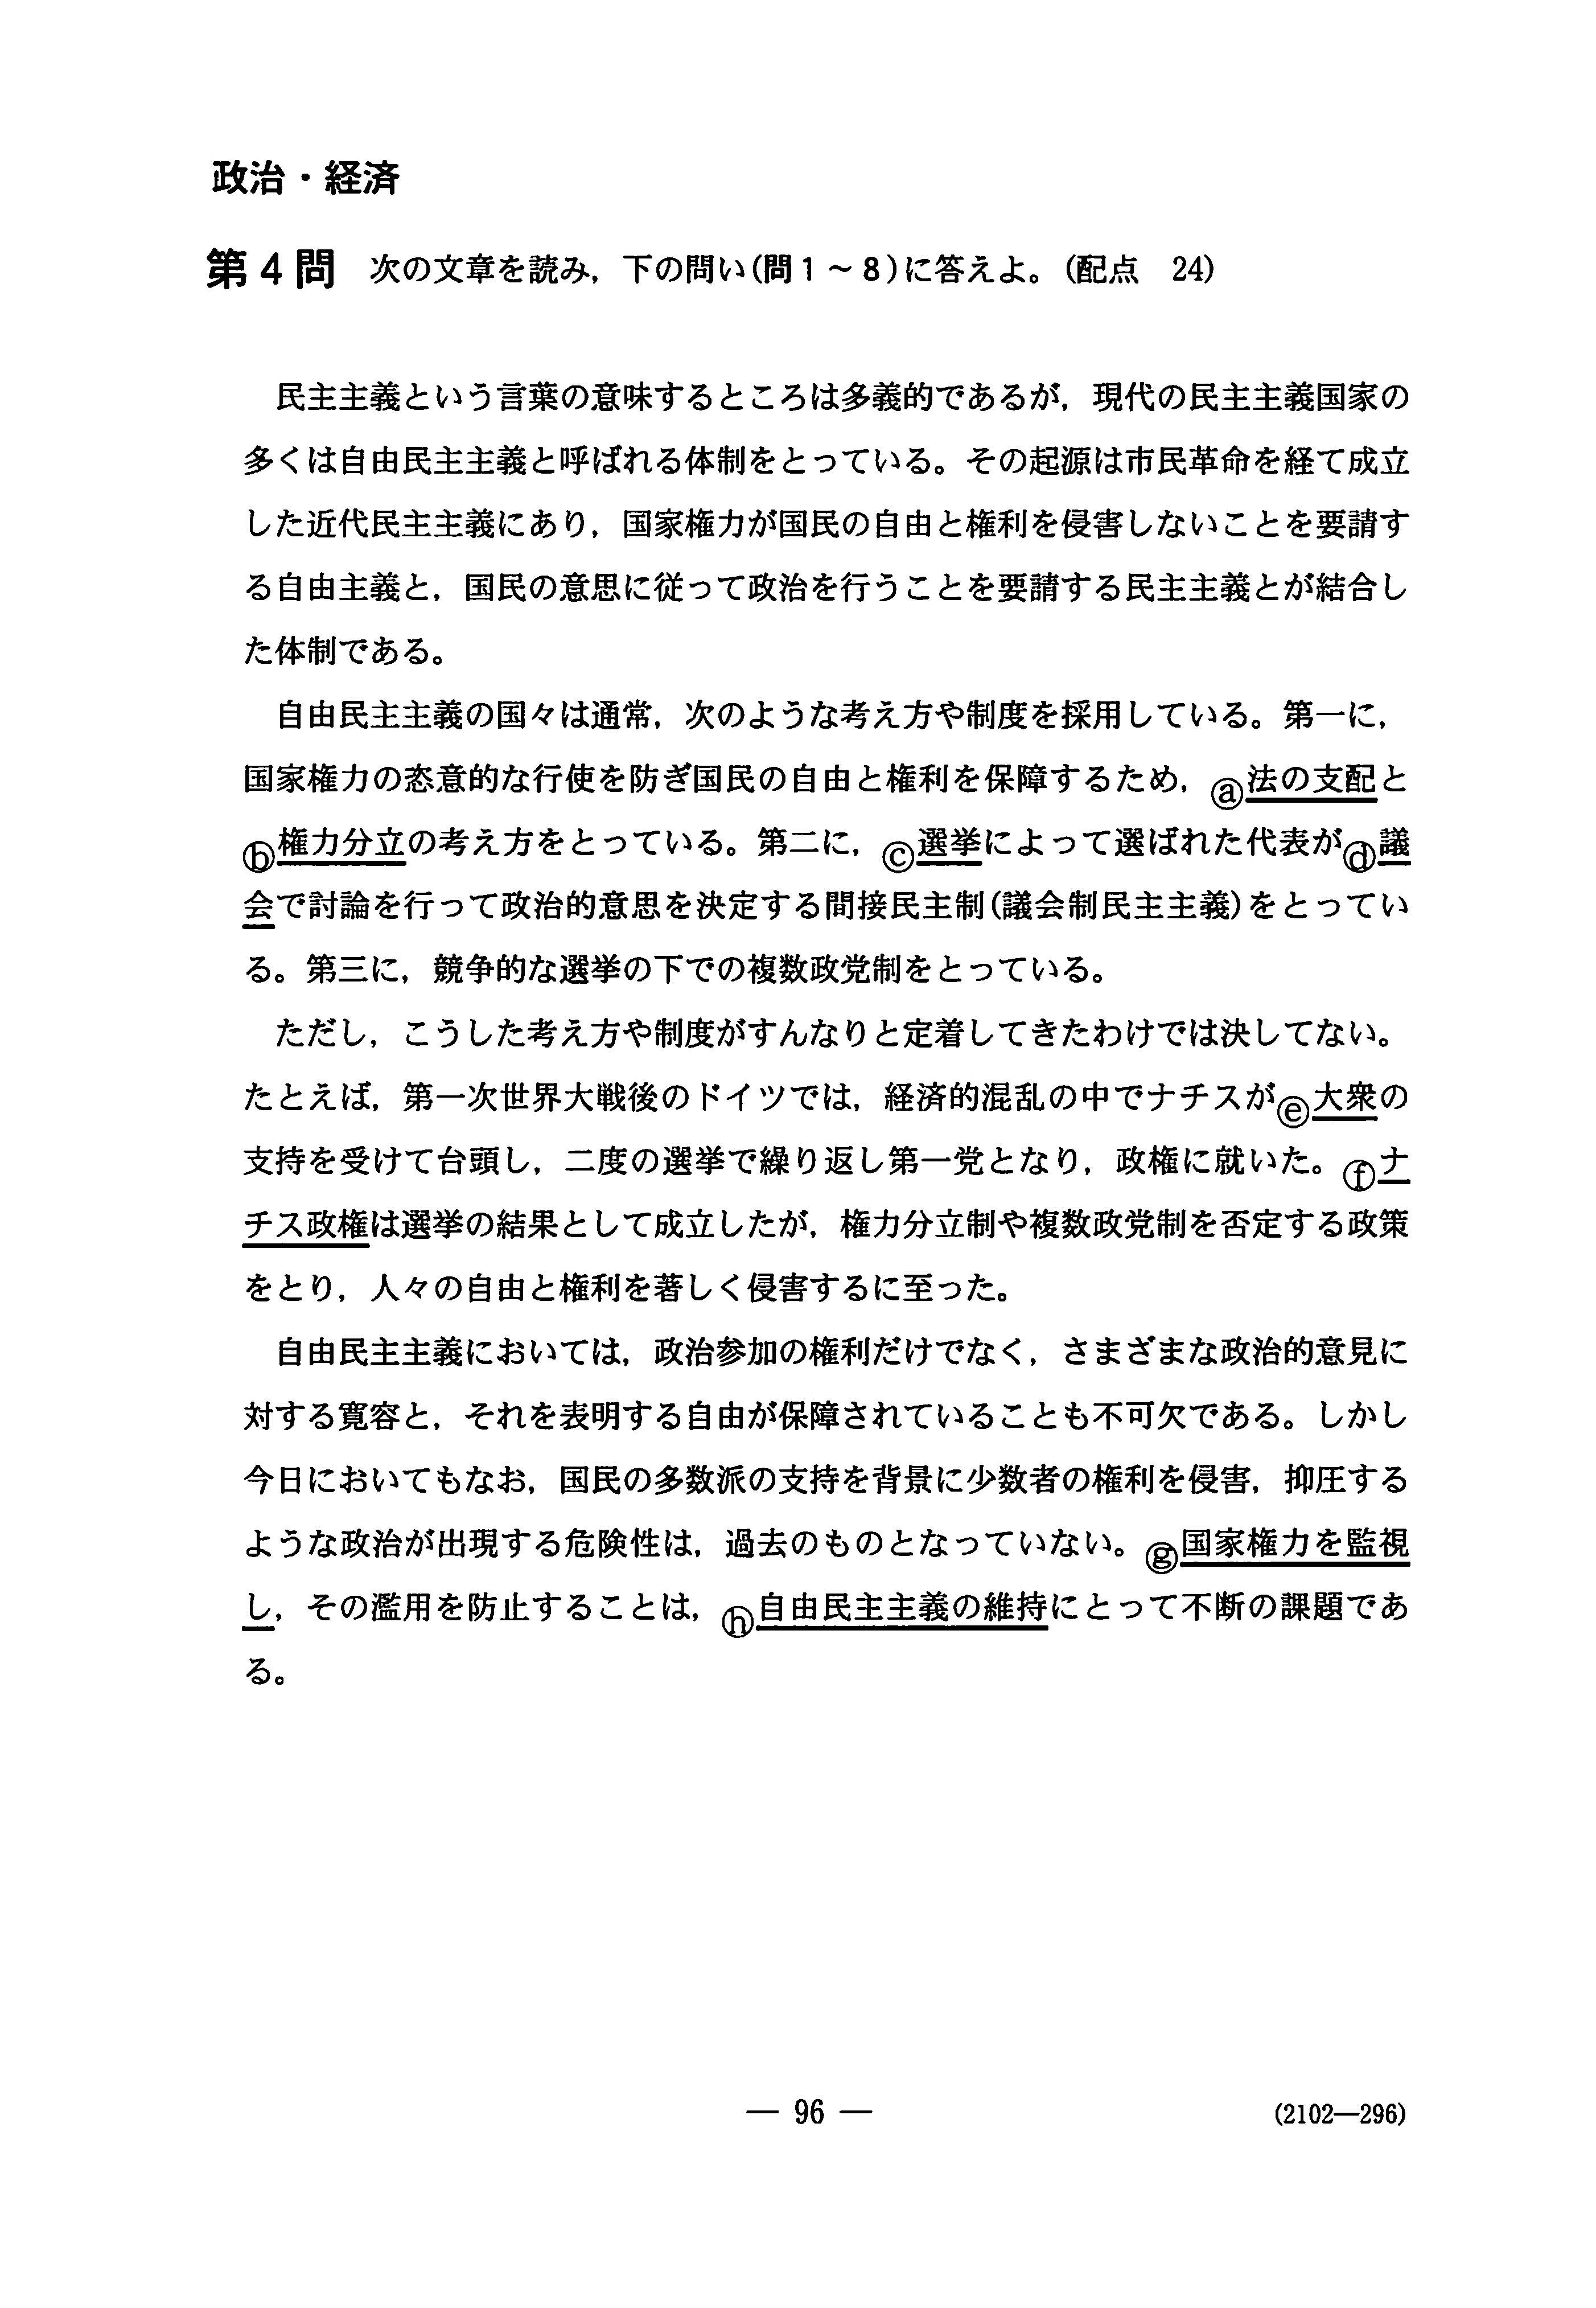 政治・経済 公民 2020年 令和2年 センター試験過去問題